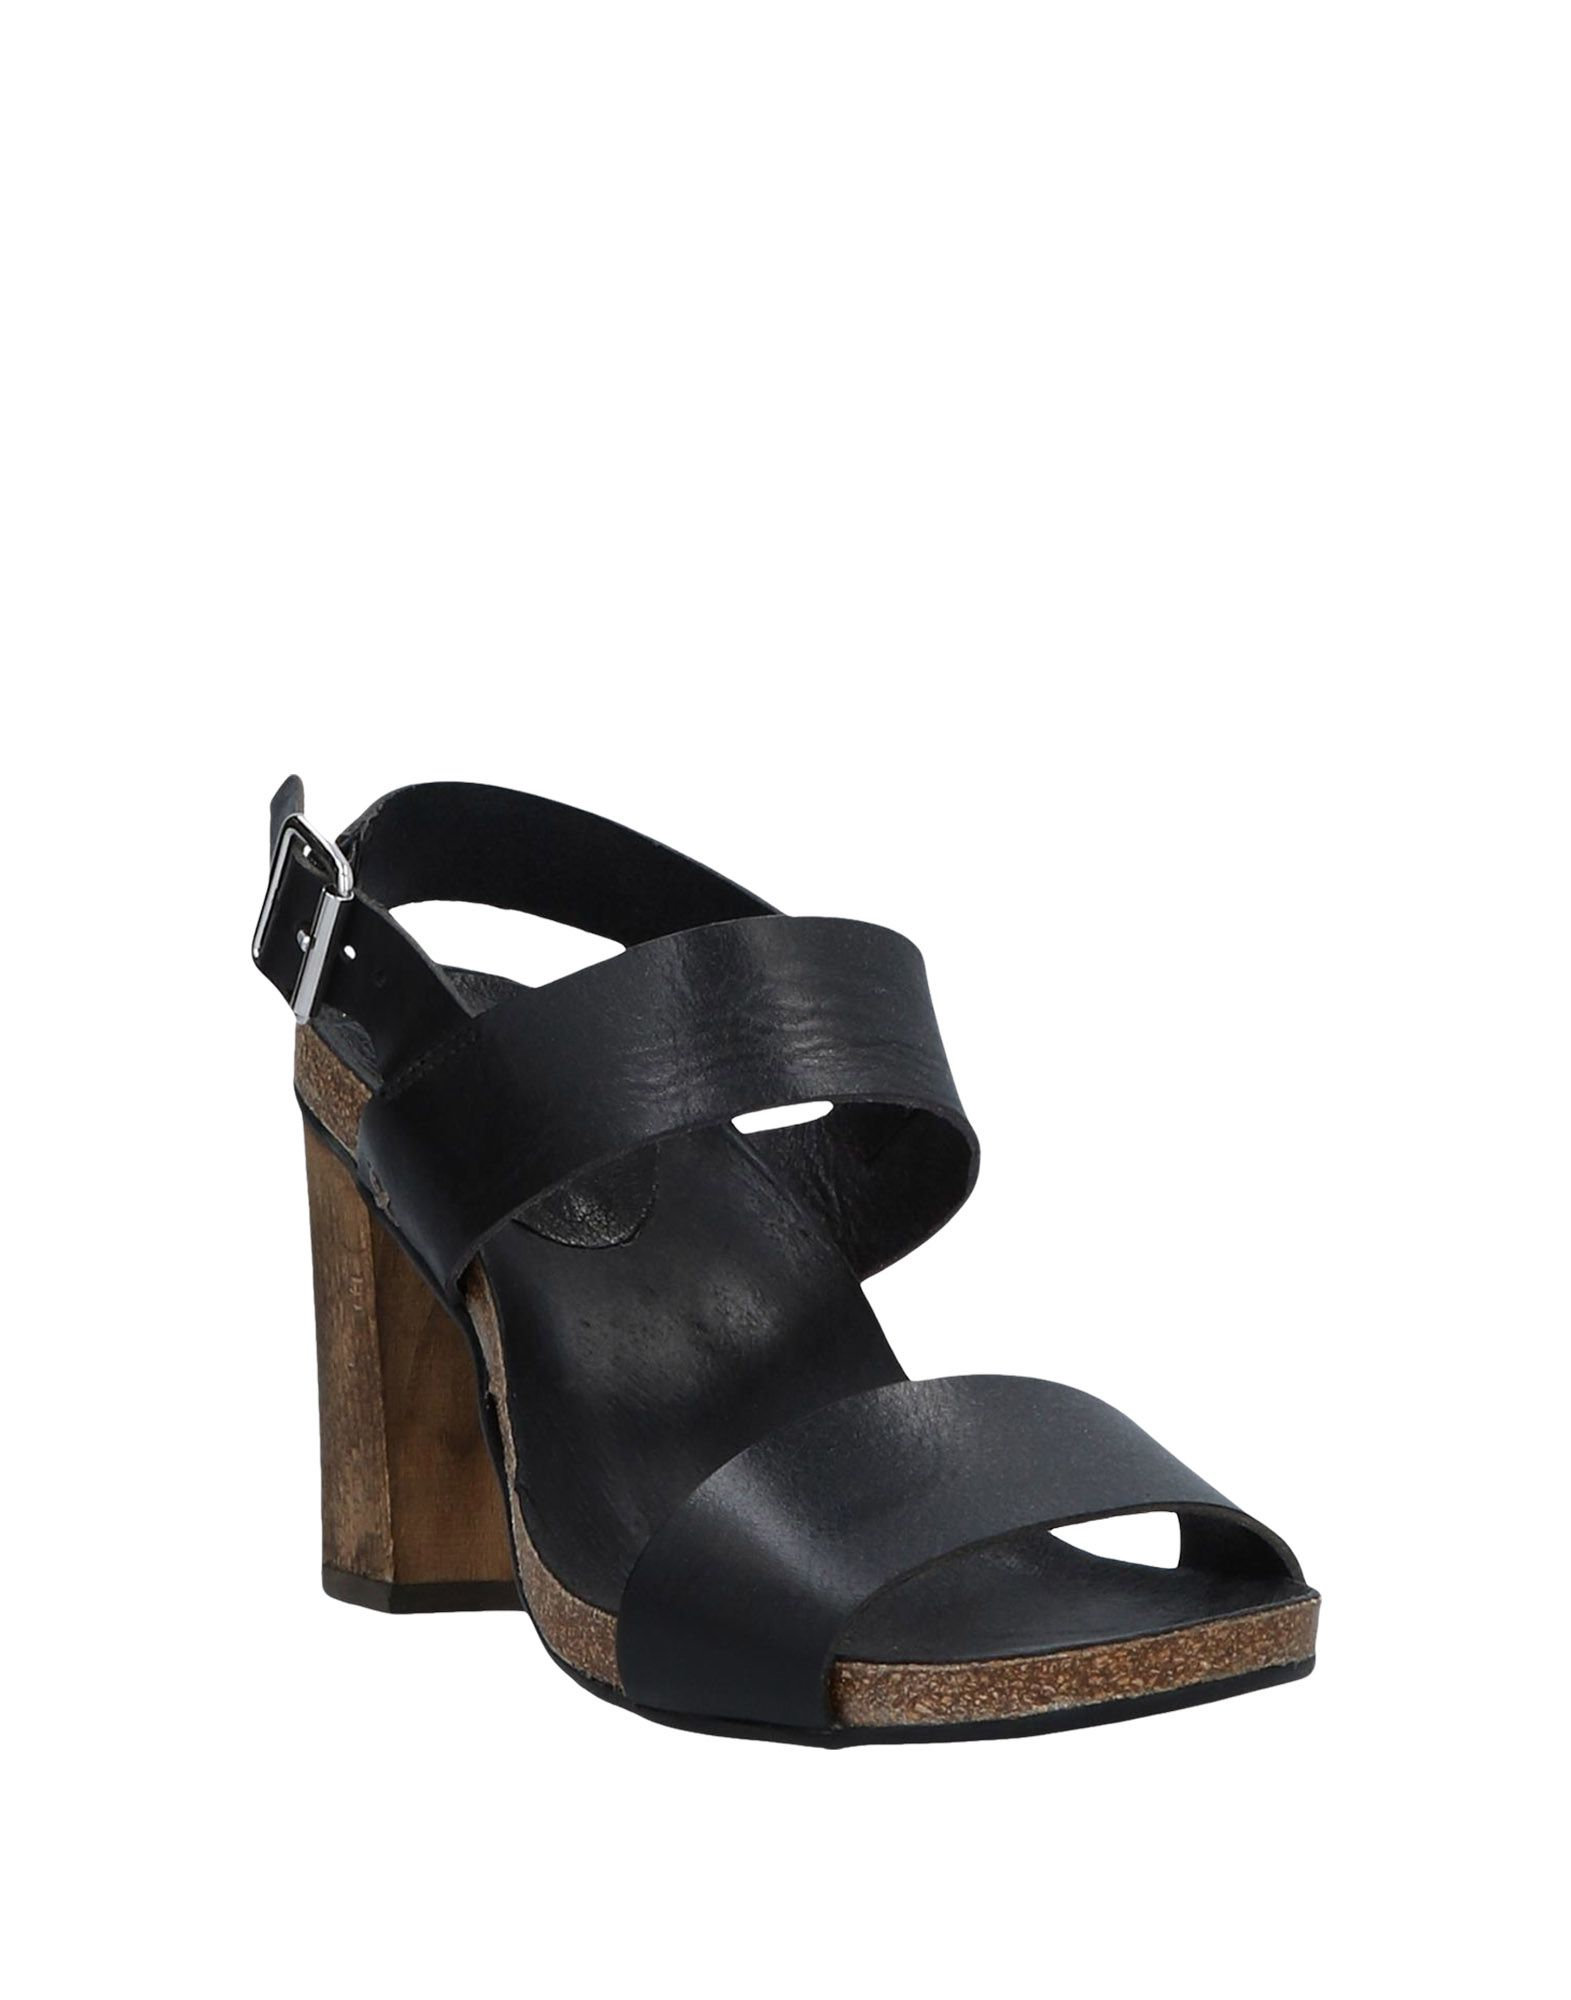 Giovanni Ciarpella Damen Sandalen Damen Ciarpella  44946613KA Gute Qualität beliebte Schuhe 974b3d